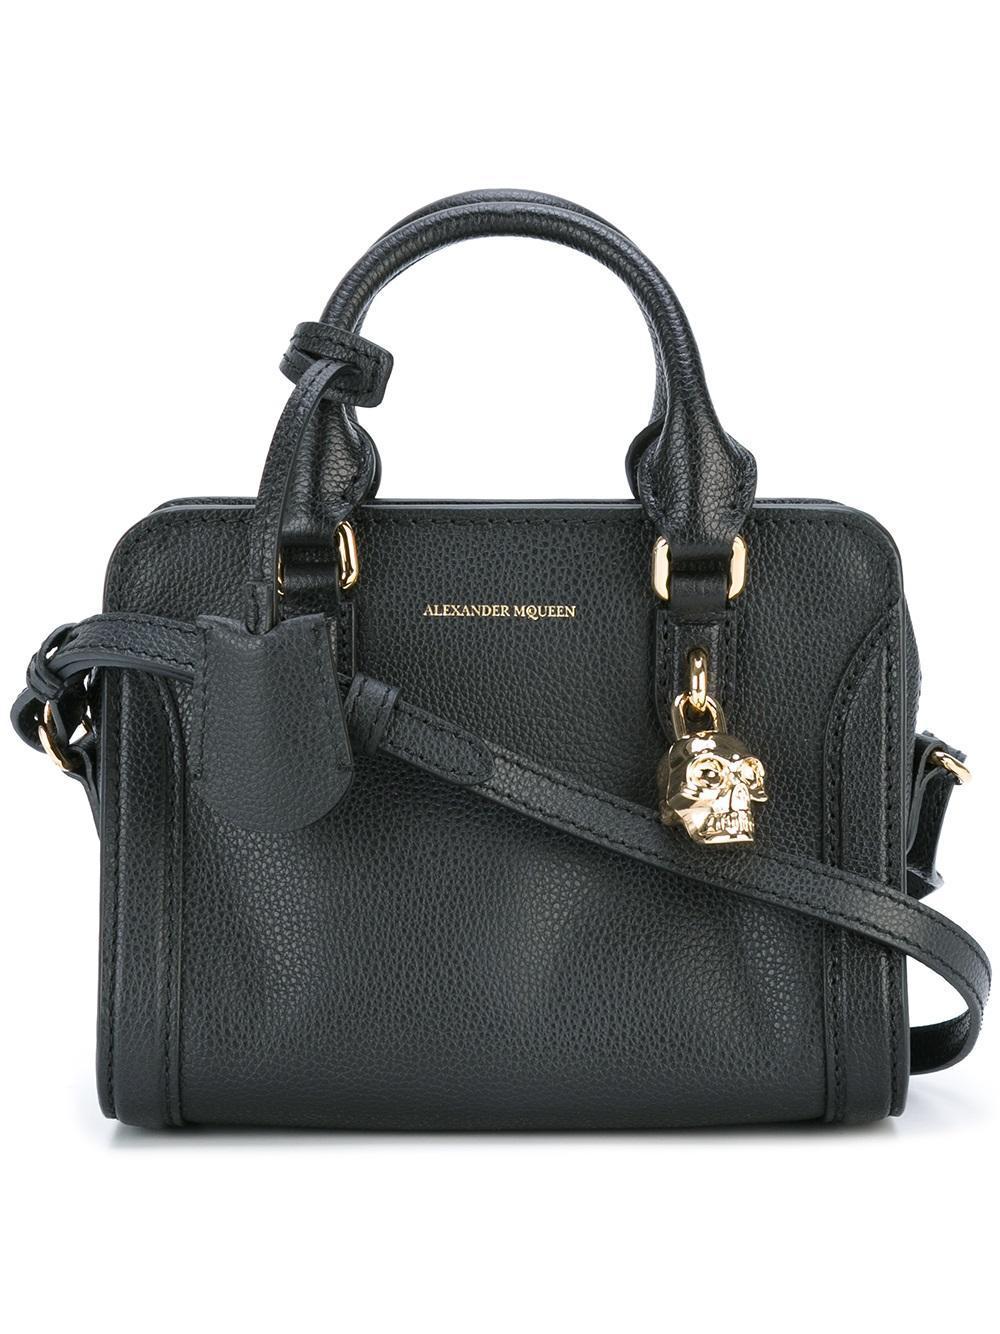 Black Label Price >> Alexander McQueen Leather Padlock Crossbody Bag in Black ...